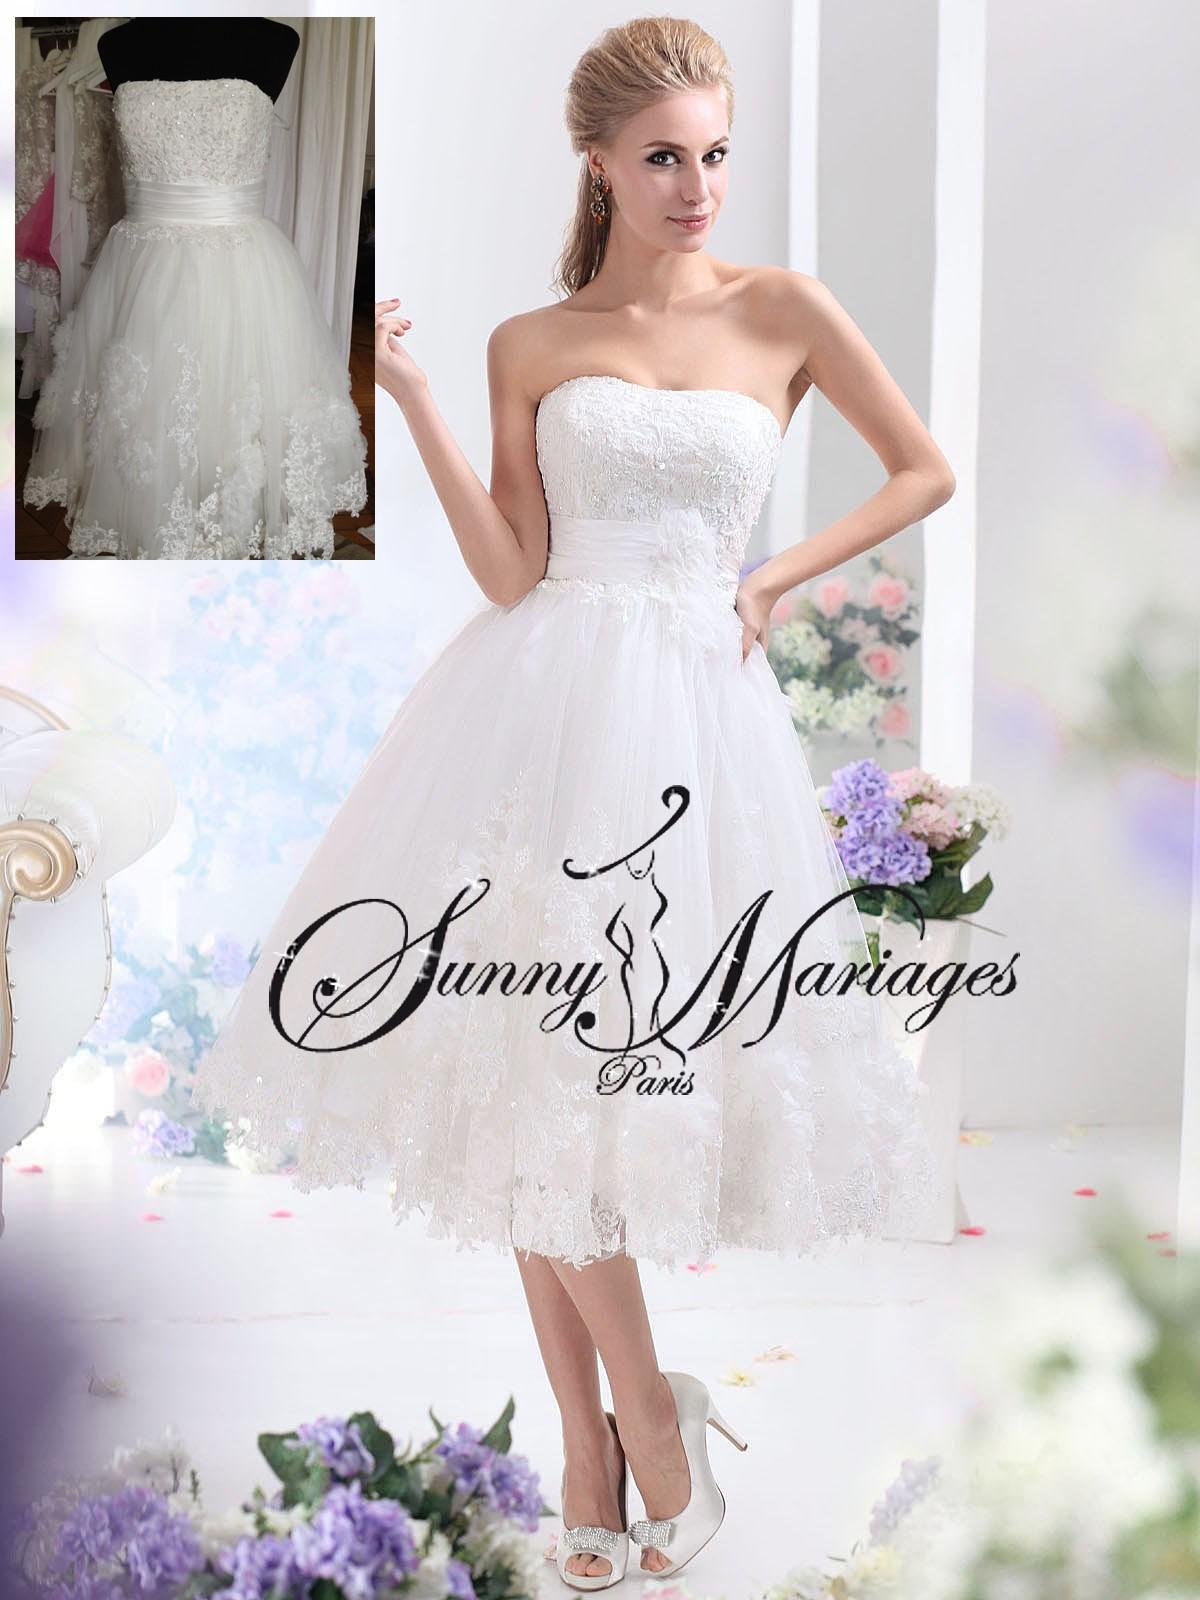 Robe de mariee courte en dentelle blanche